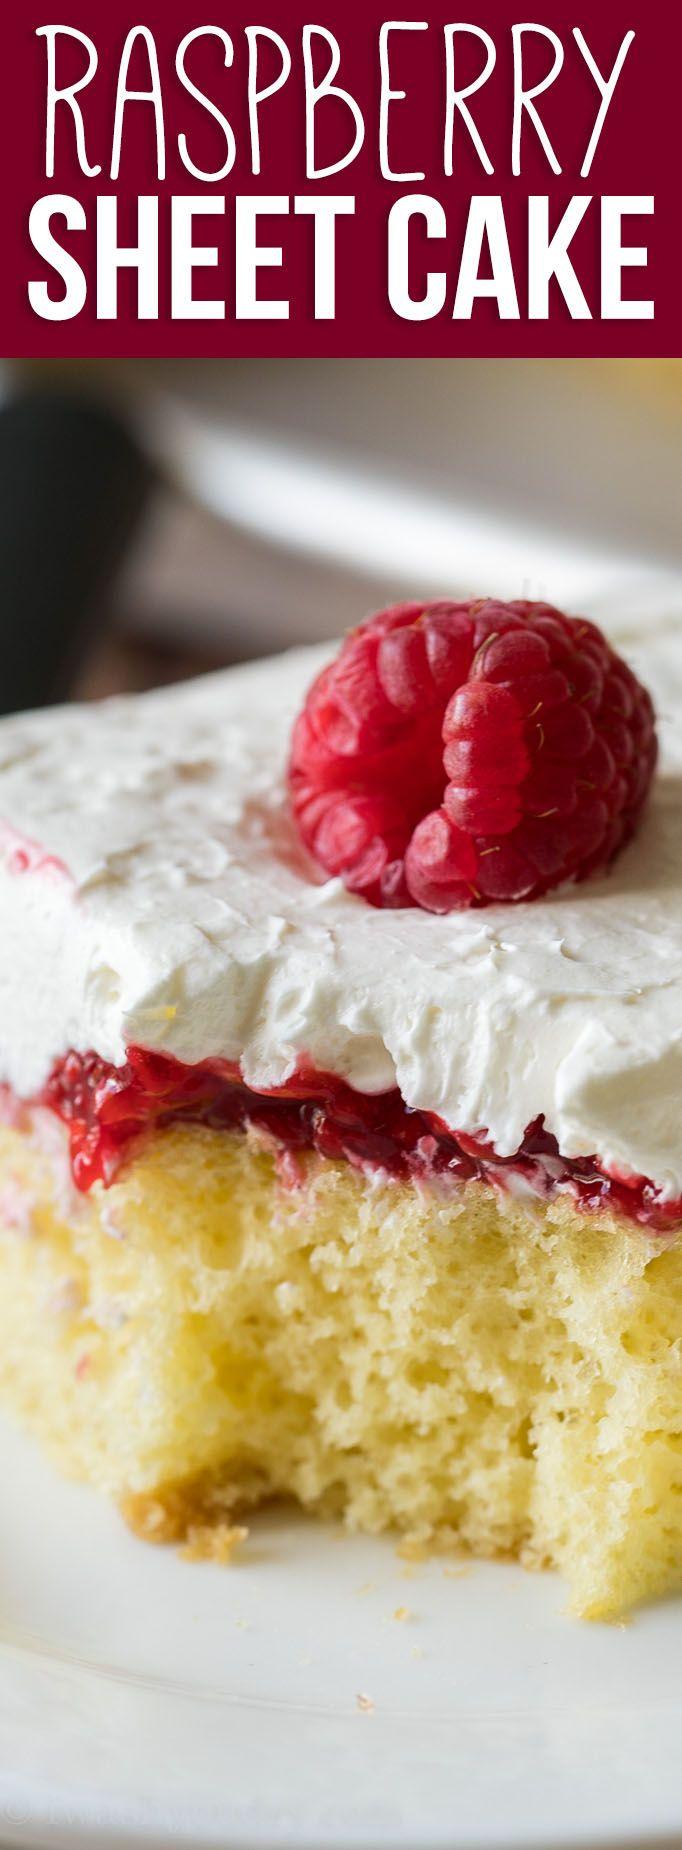 Vanilla Raspberry Sheet Cake -   12 desserts For Parties cake ideas